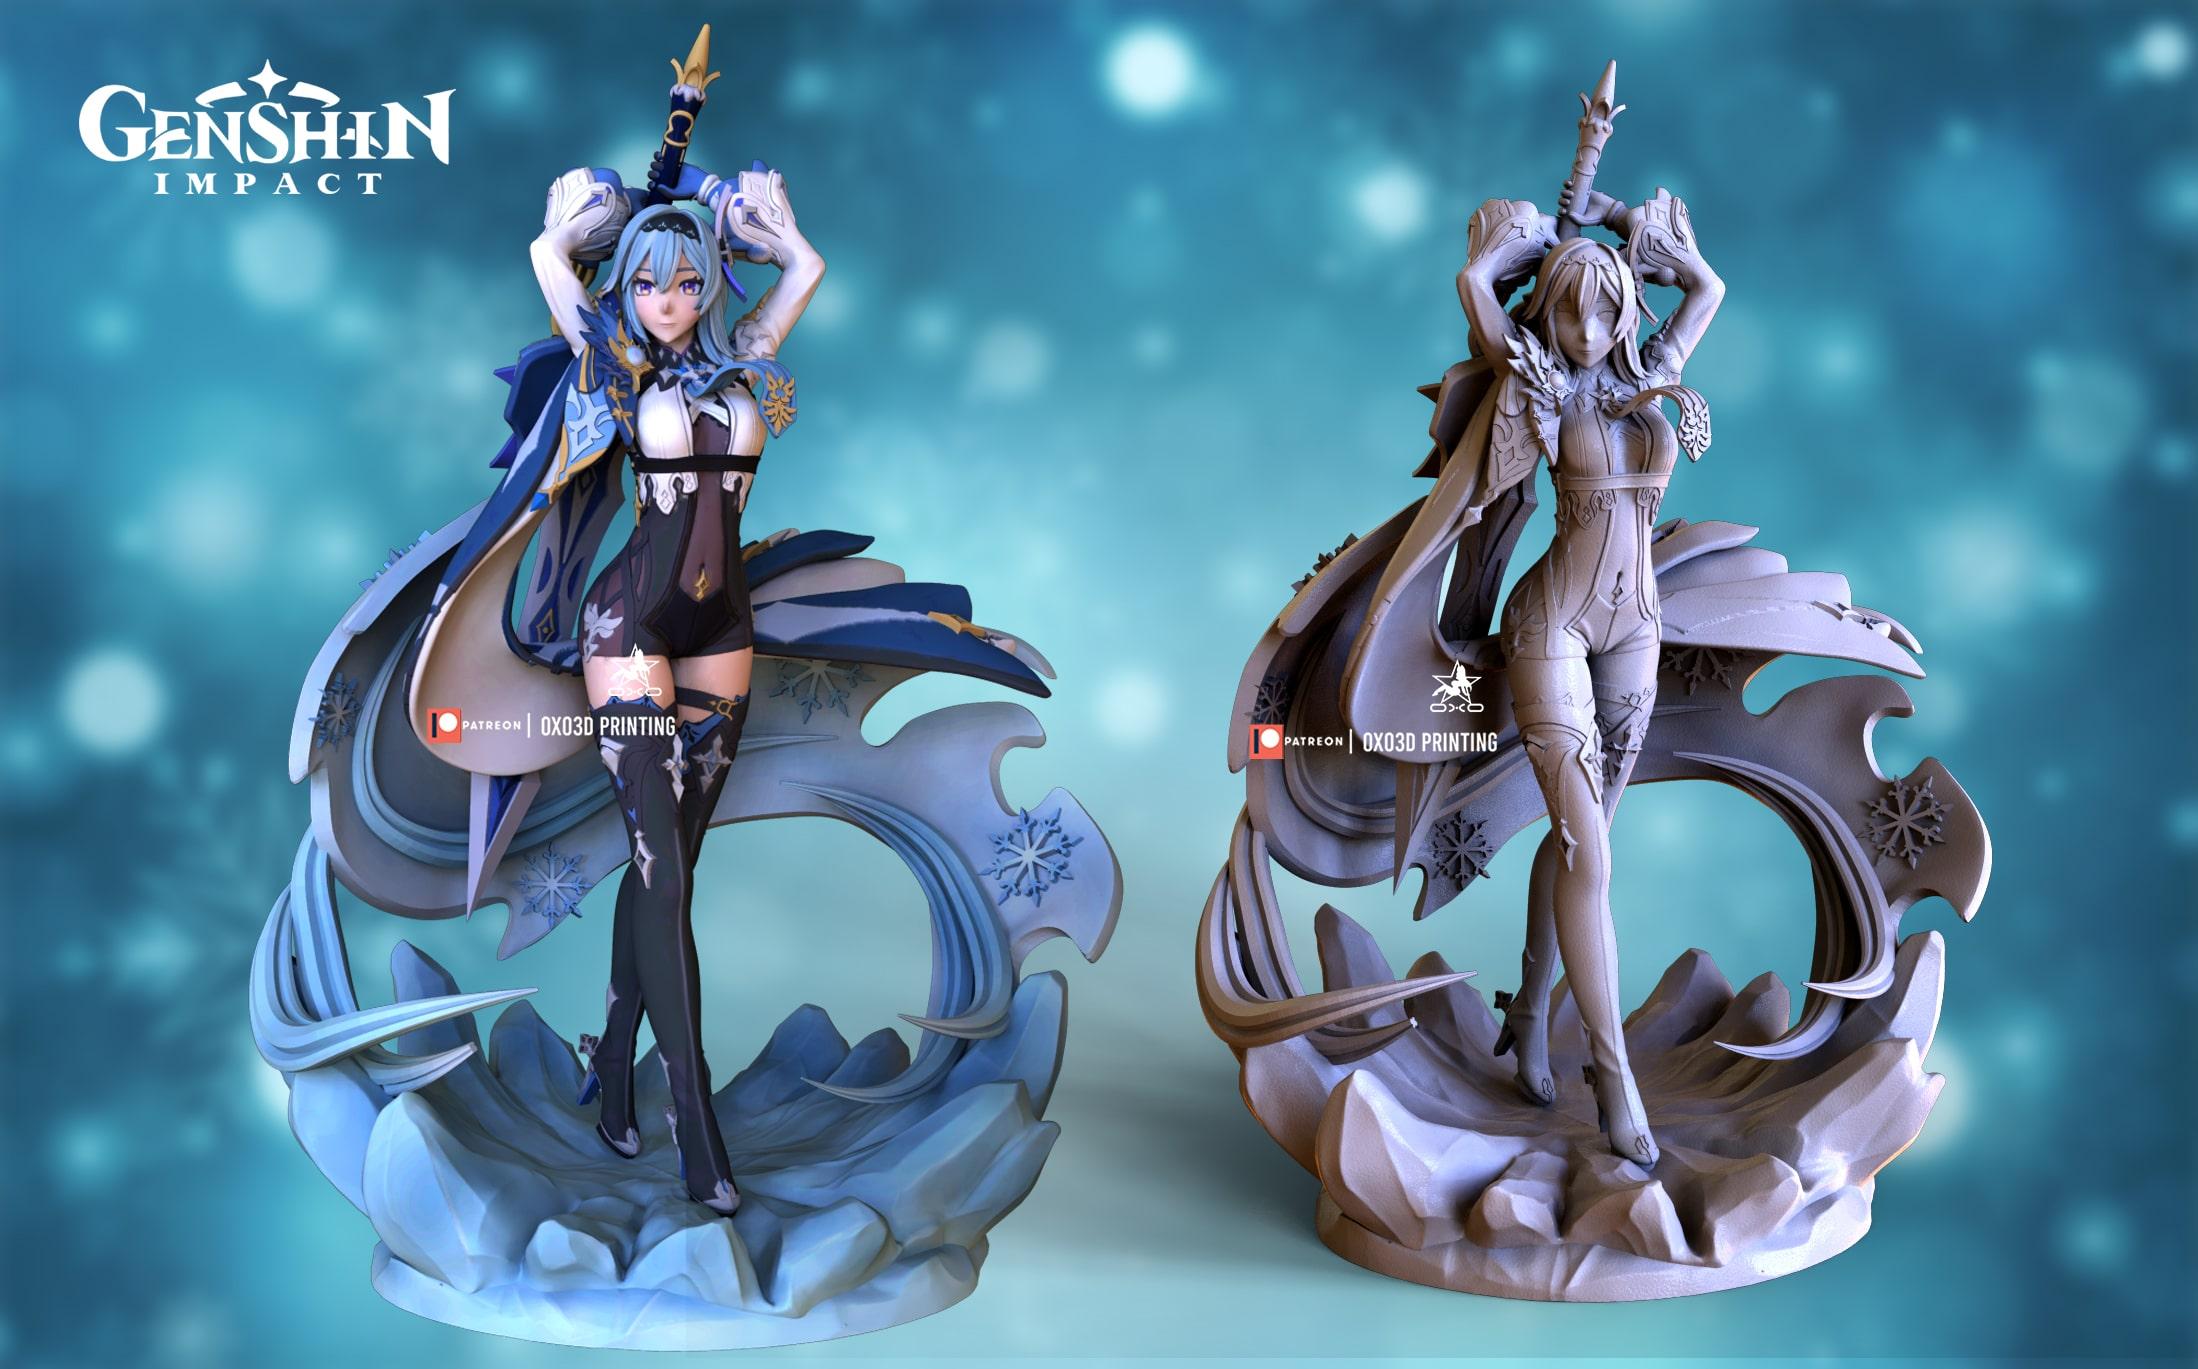 Eula/Yura From Genshin Impact 3D Print STL File - Standard version with Base